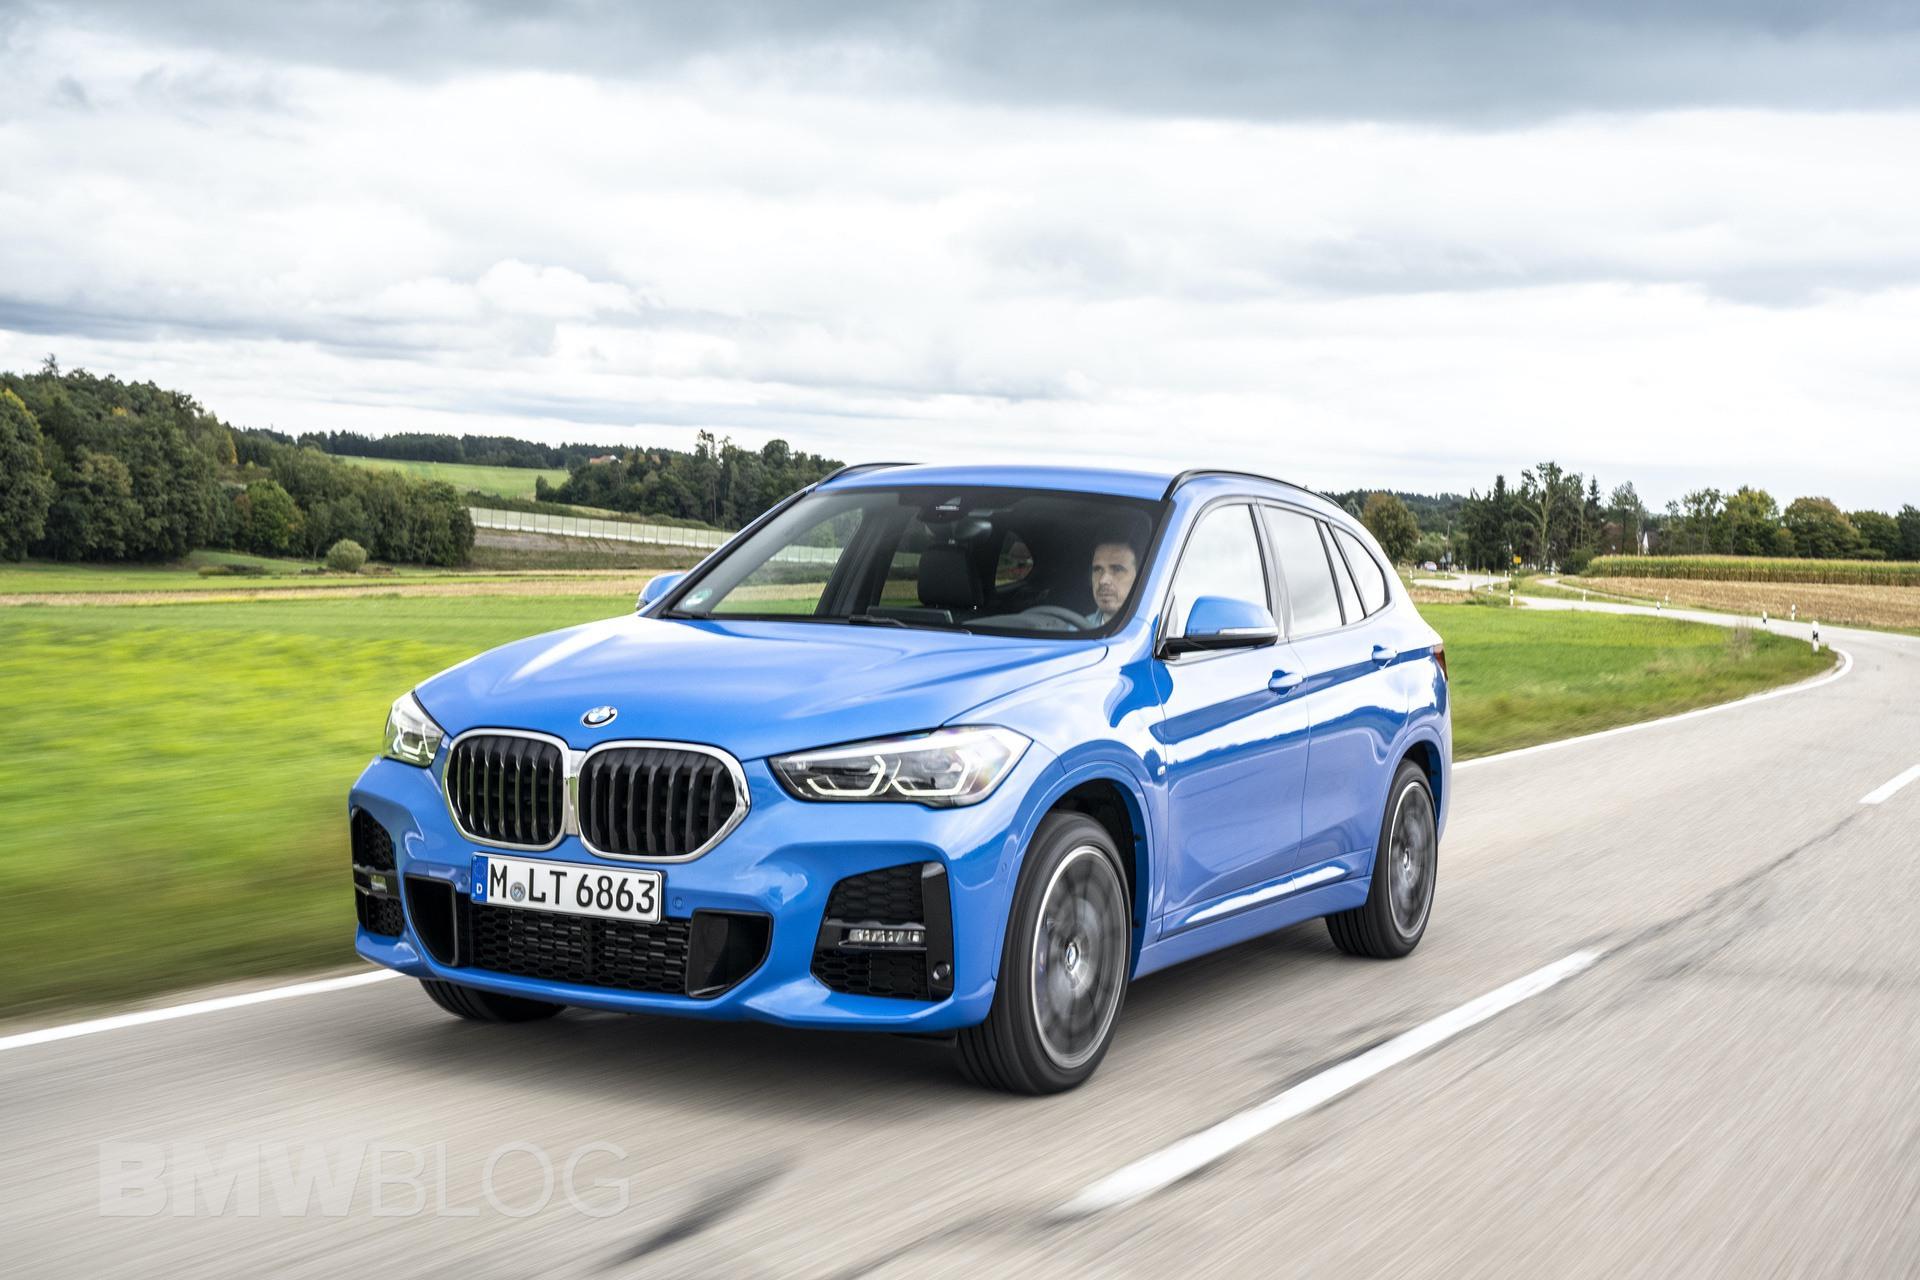 2020 BMW X1 facelift test drive 1